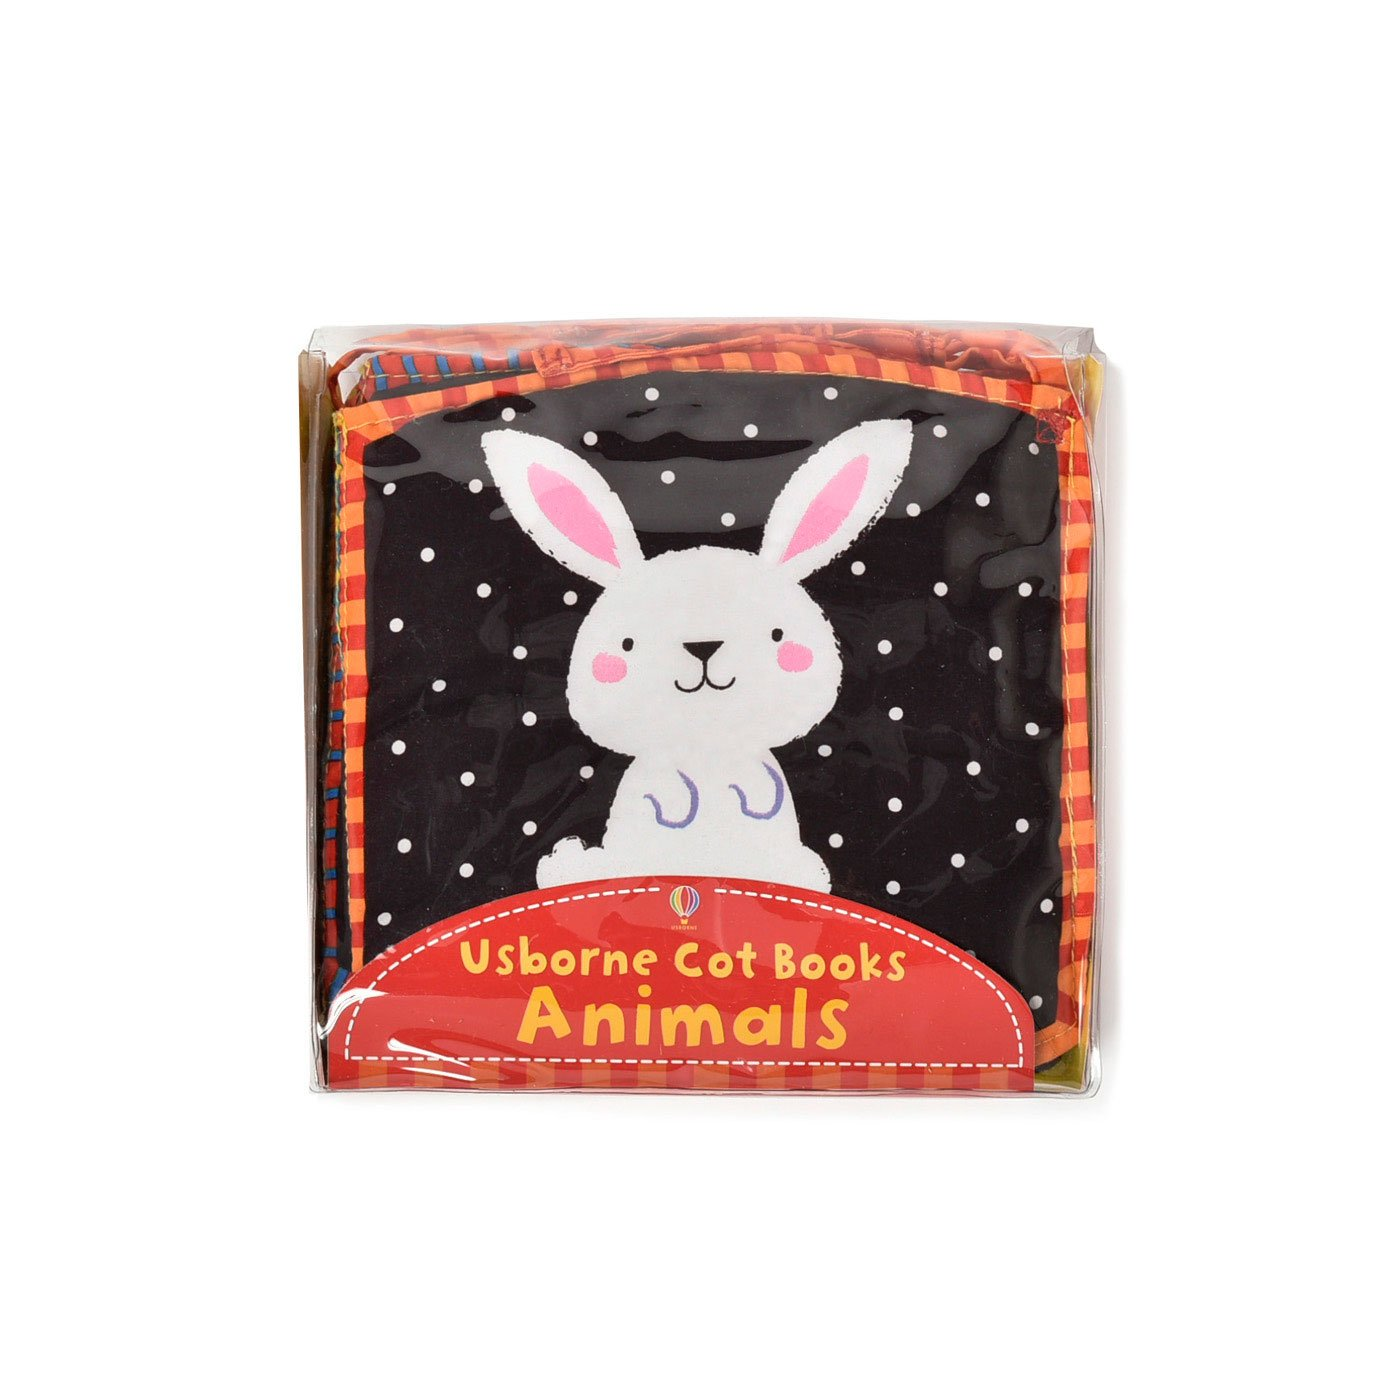 Cot Books 赤ちゃんの布えほん Animals